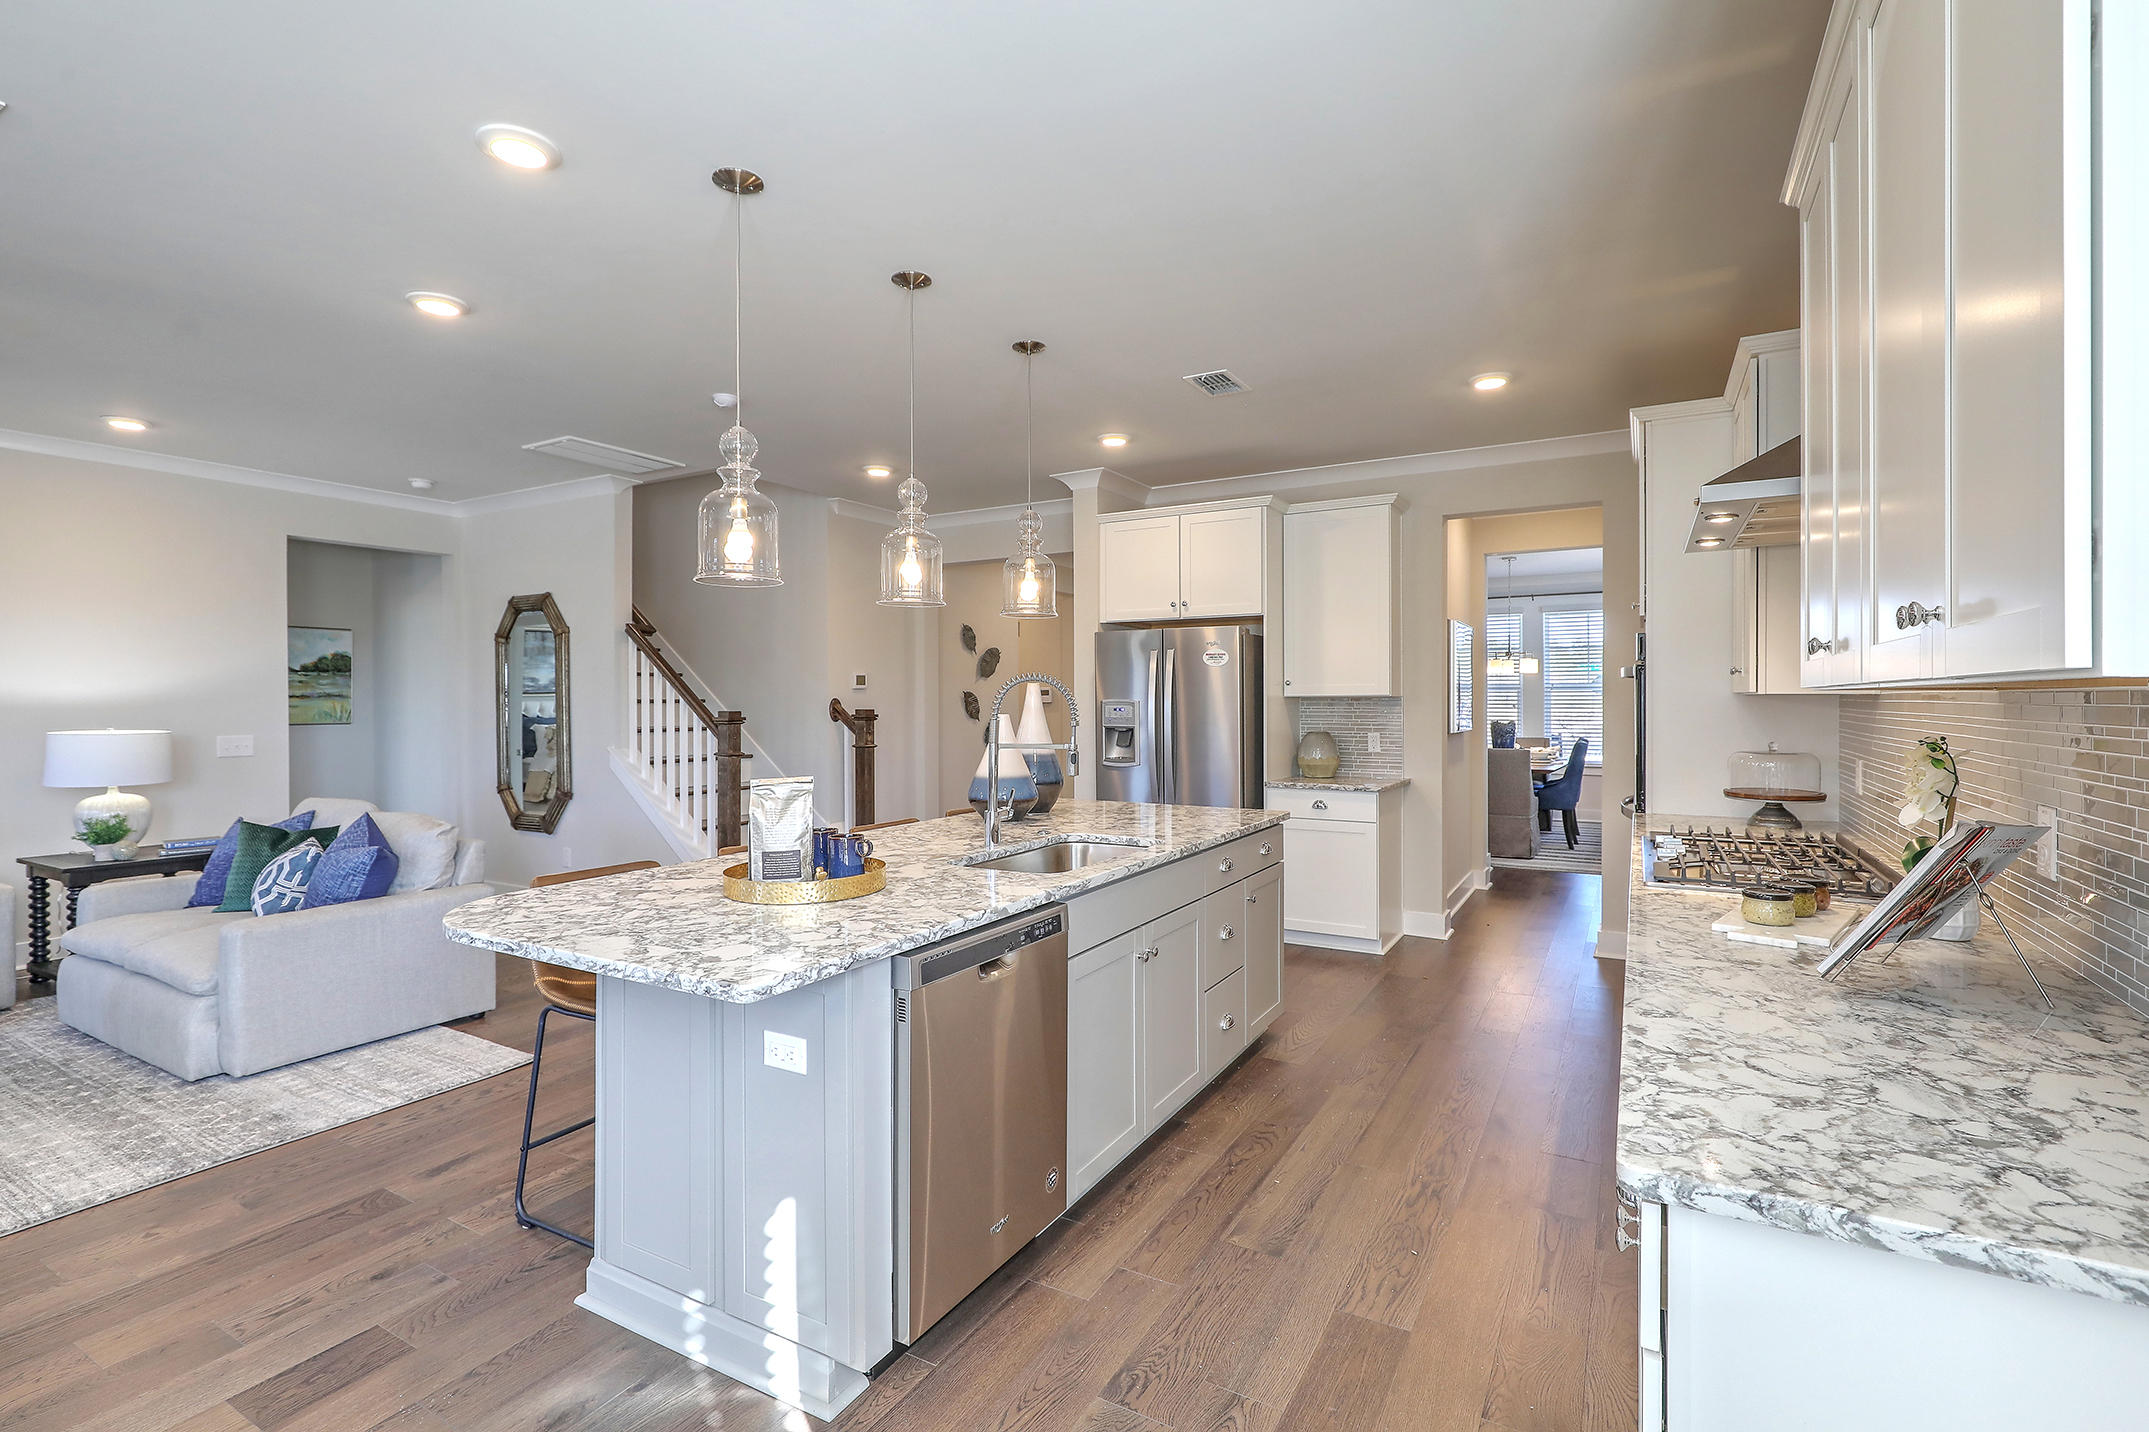 Bentley Park Homes For Sale - 1273 Gannett, Mount Pleasant, SC - 37